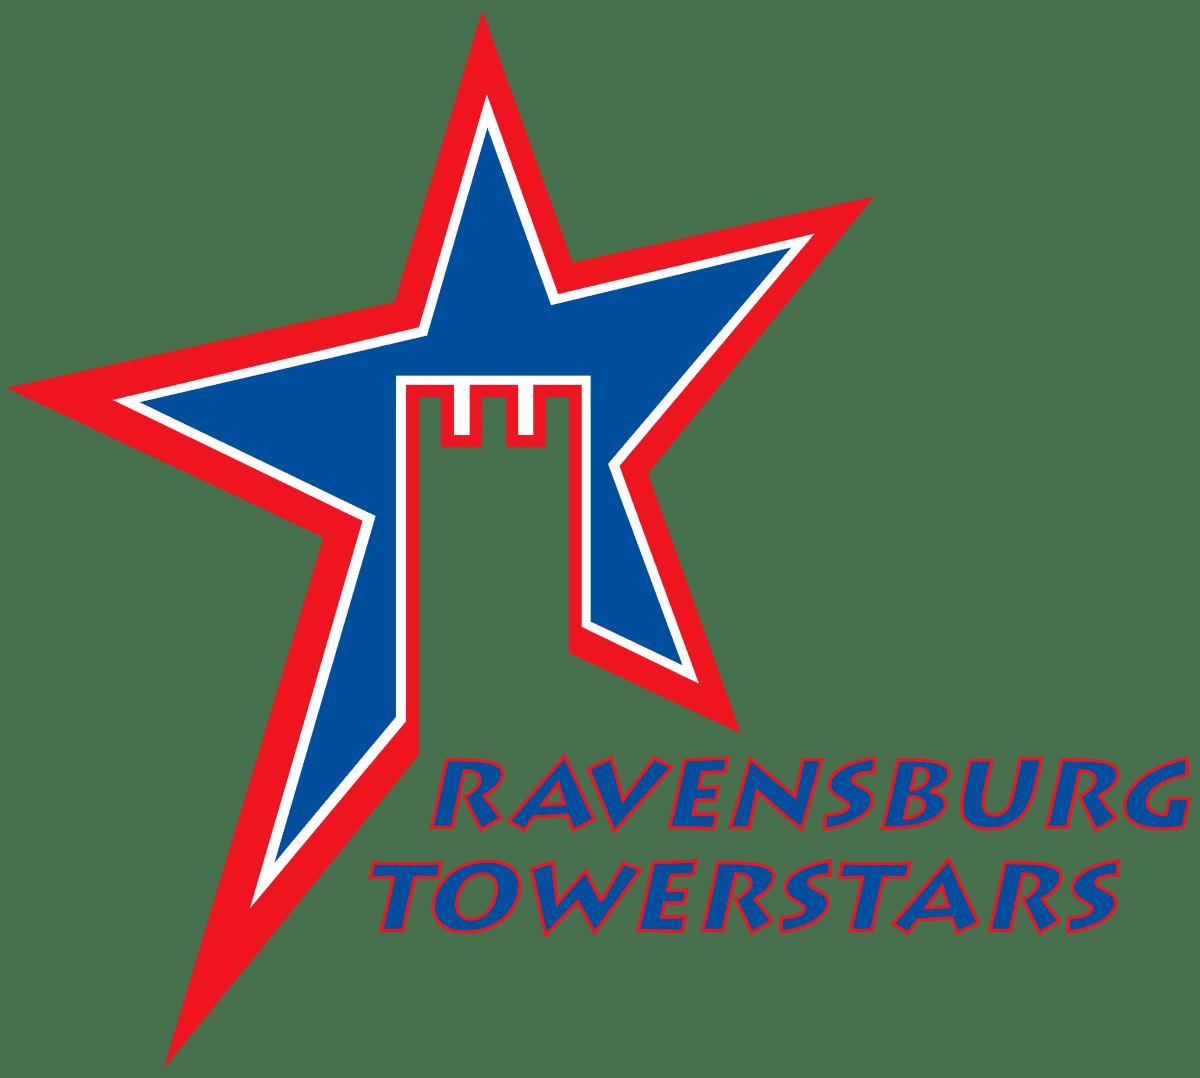 ravensburg towerstars wetten